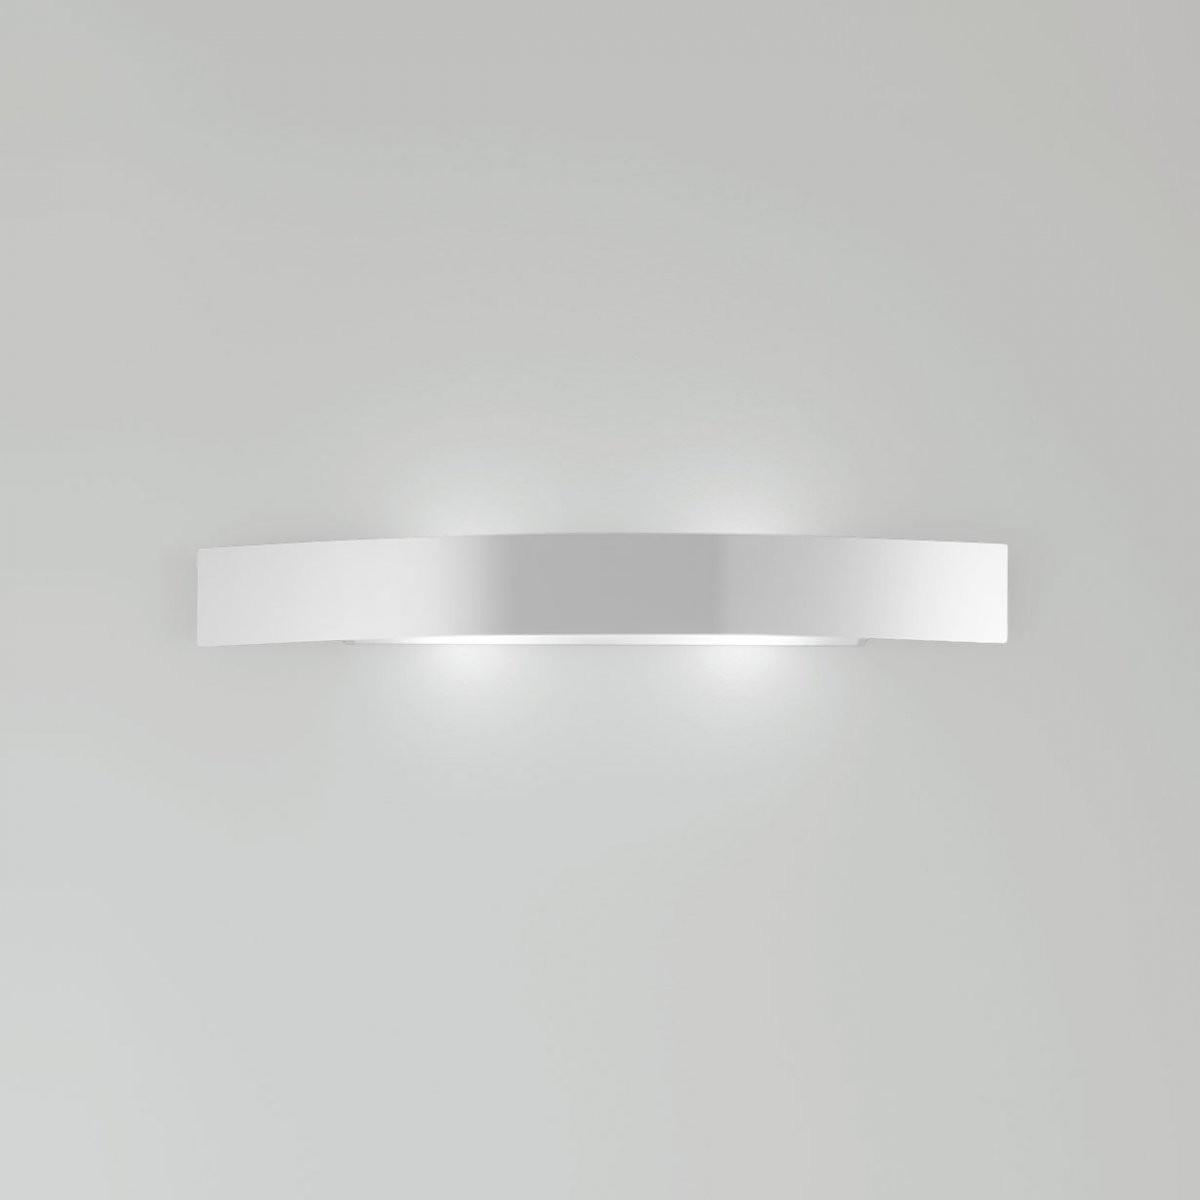 riga wall muro light lampada lamp fontana arte bianca 2. Black Bedroom Furniture Sets. Home Design Ideas